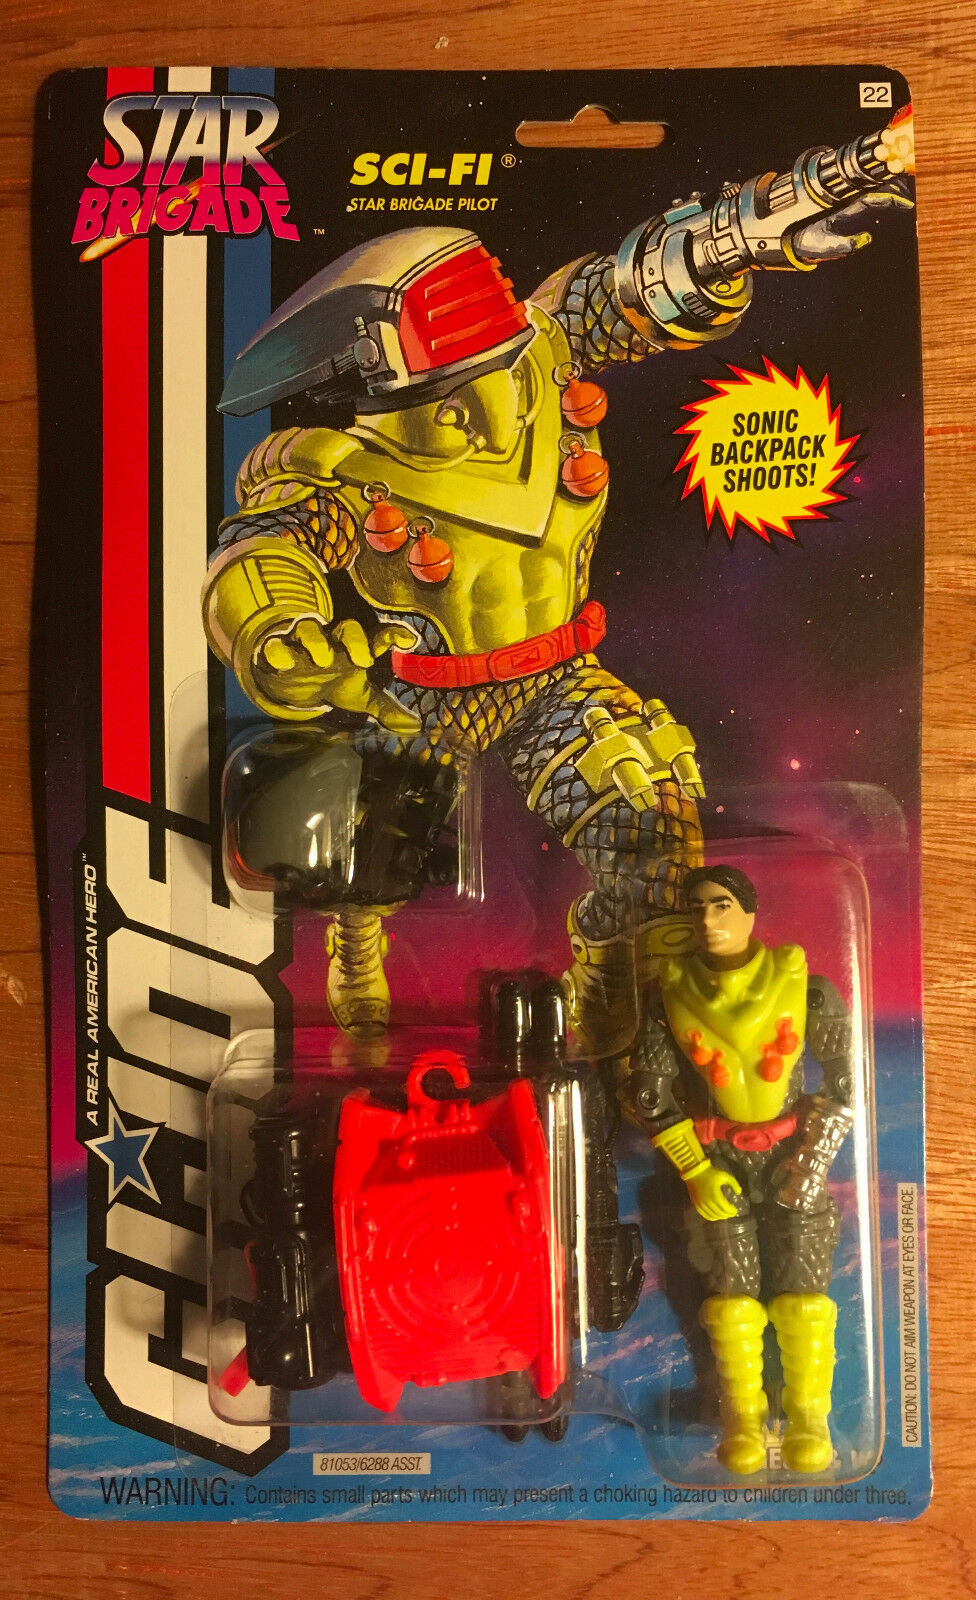 Gi - joe arah star brigade sci - fi moc - 9 + kenner us - karte, 1993